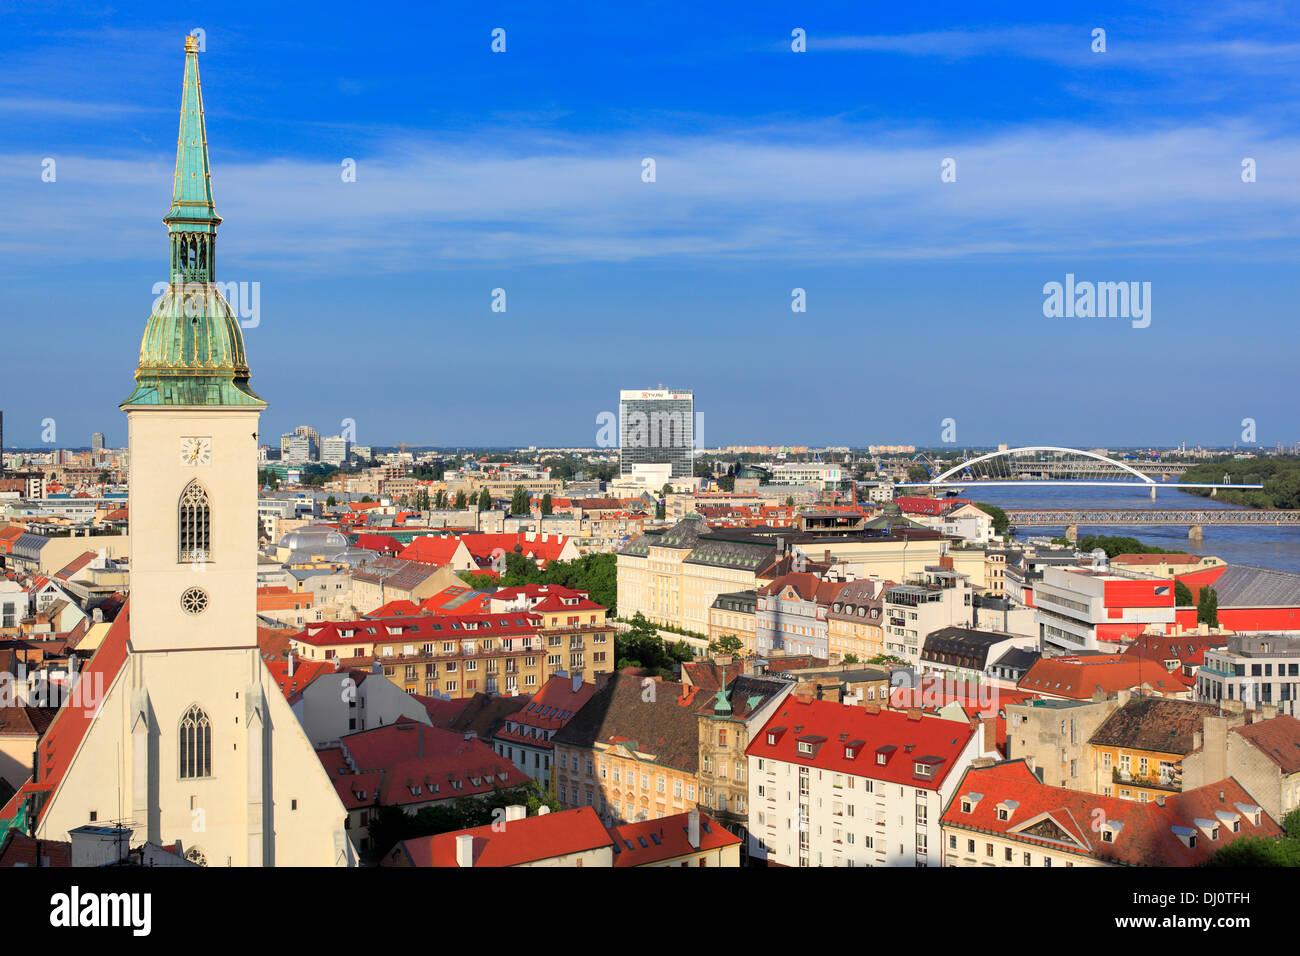 Cityscape from Bratislava castle, Bratislava, Slovakia - Stock Image